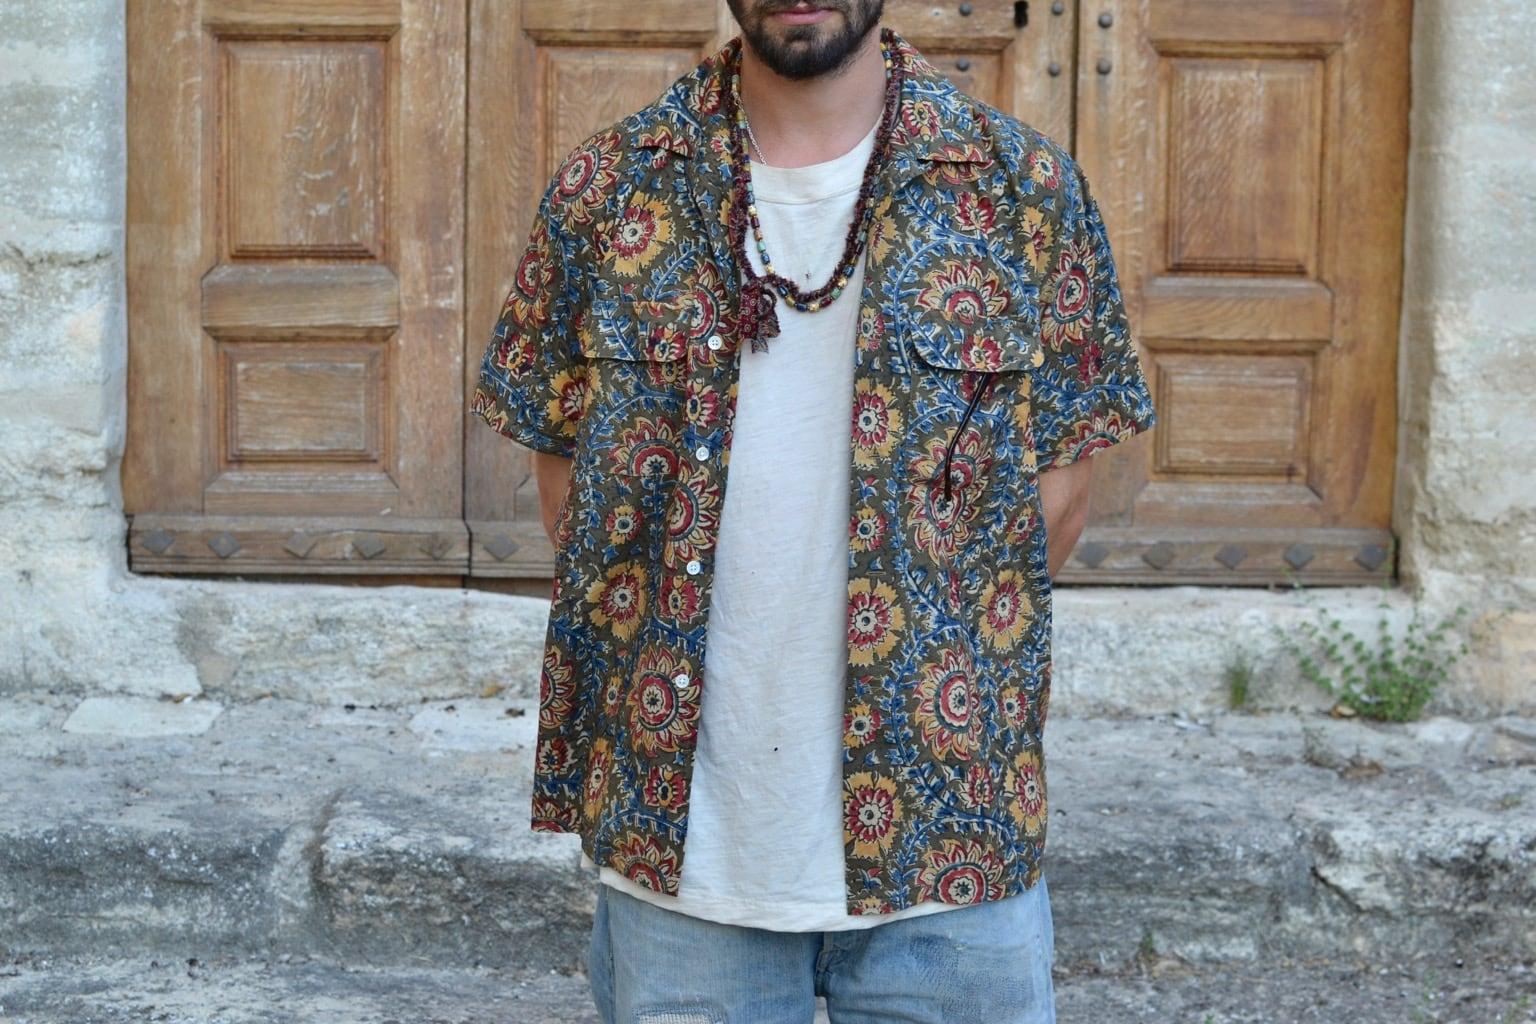 short sleeve shirt from beams plus campa collar batik shirt